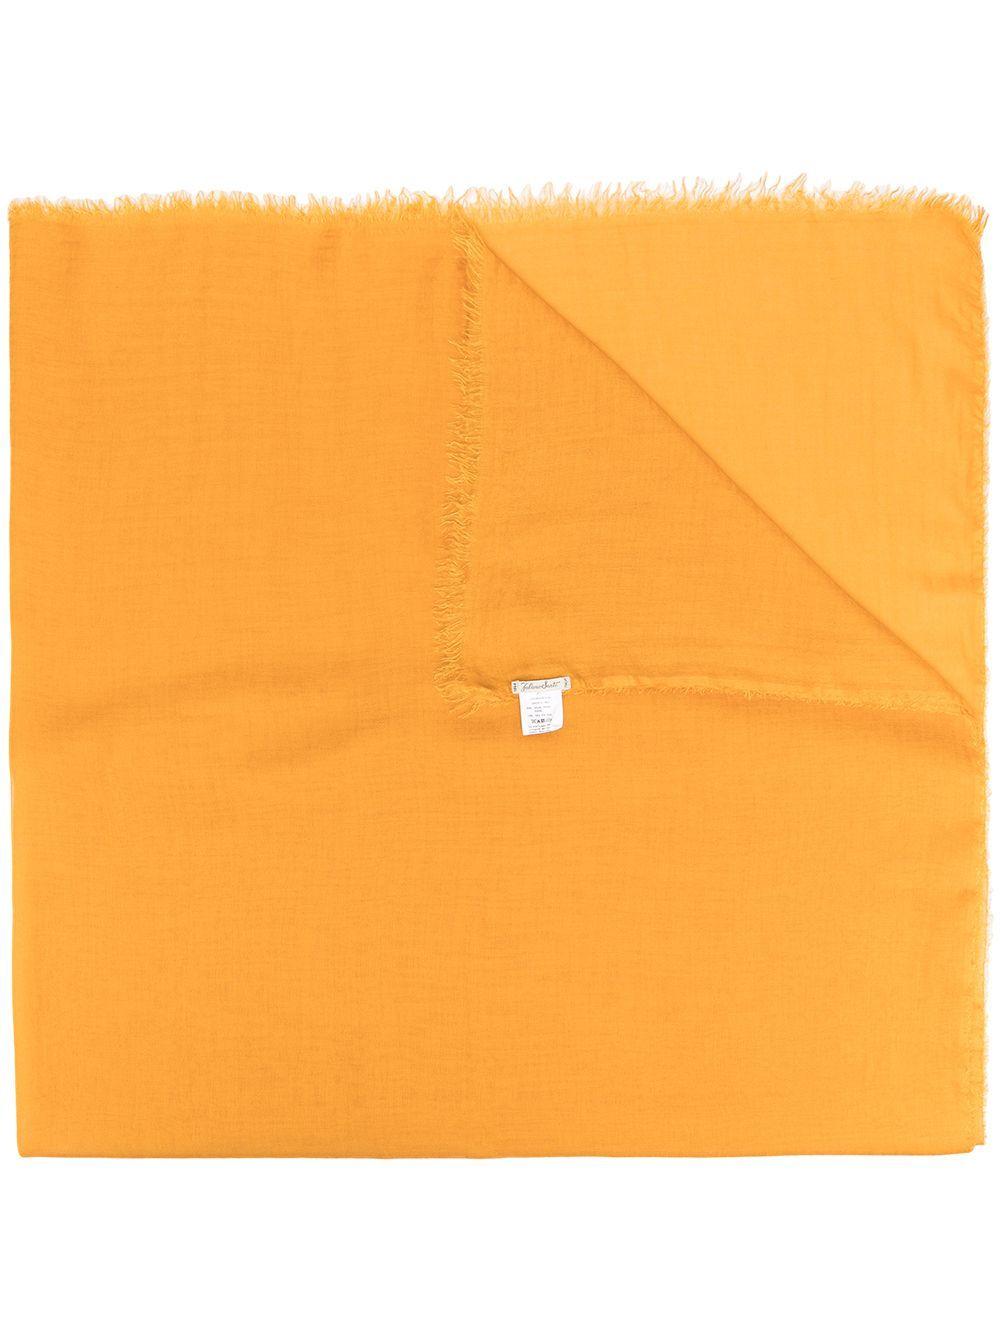 Tobia silk blend stole